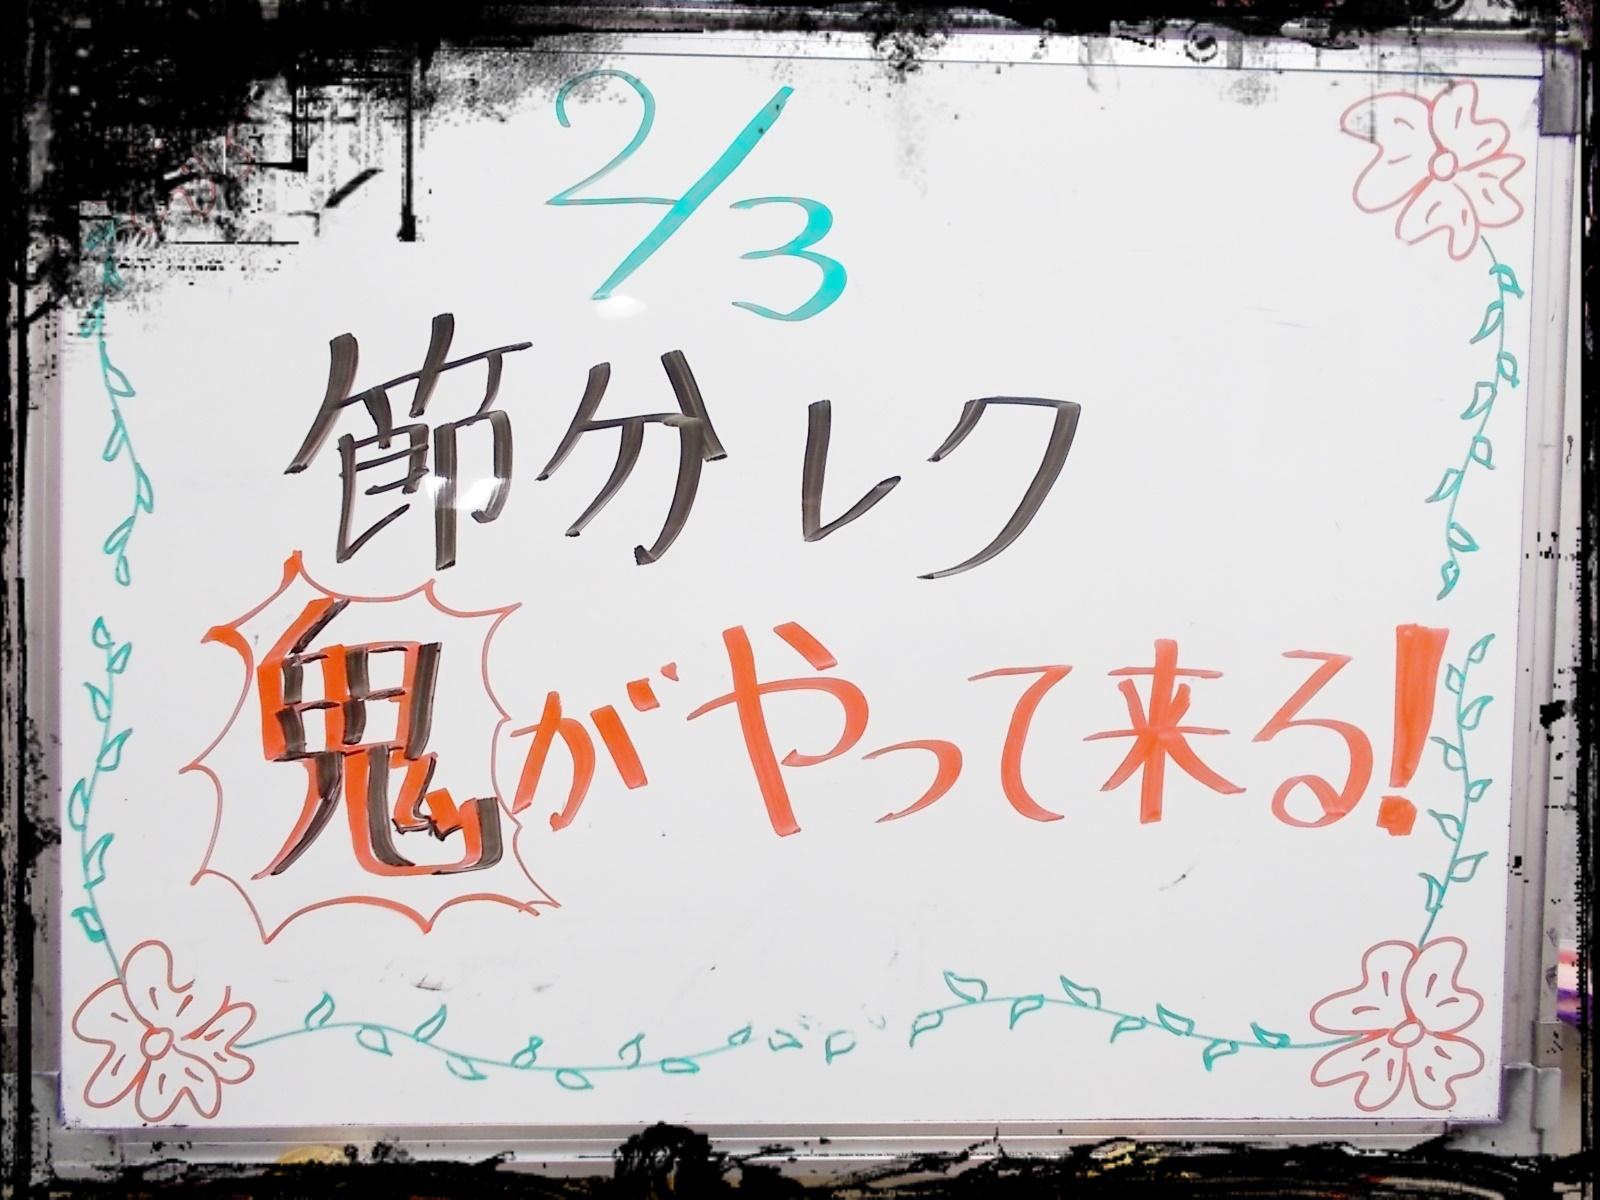 http://www.supercourt.jp/blog/hirano/DSCN2426.JPG